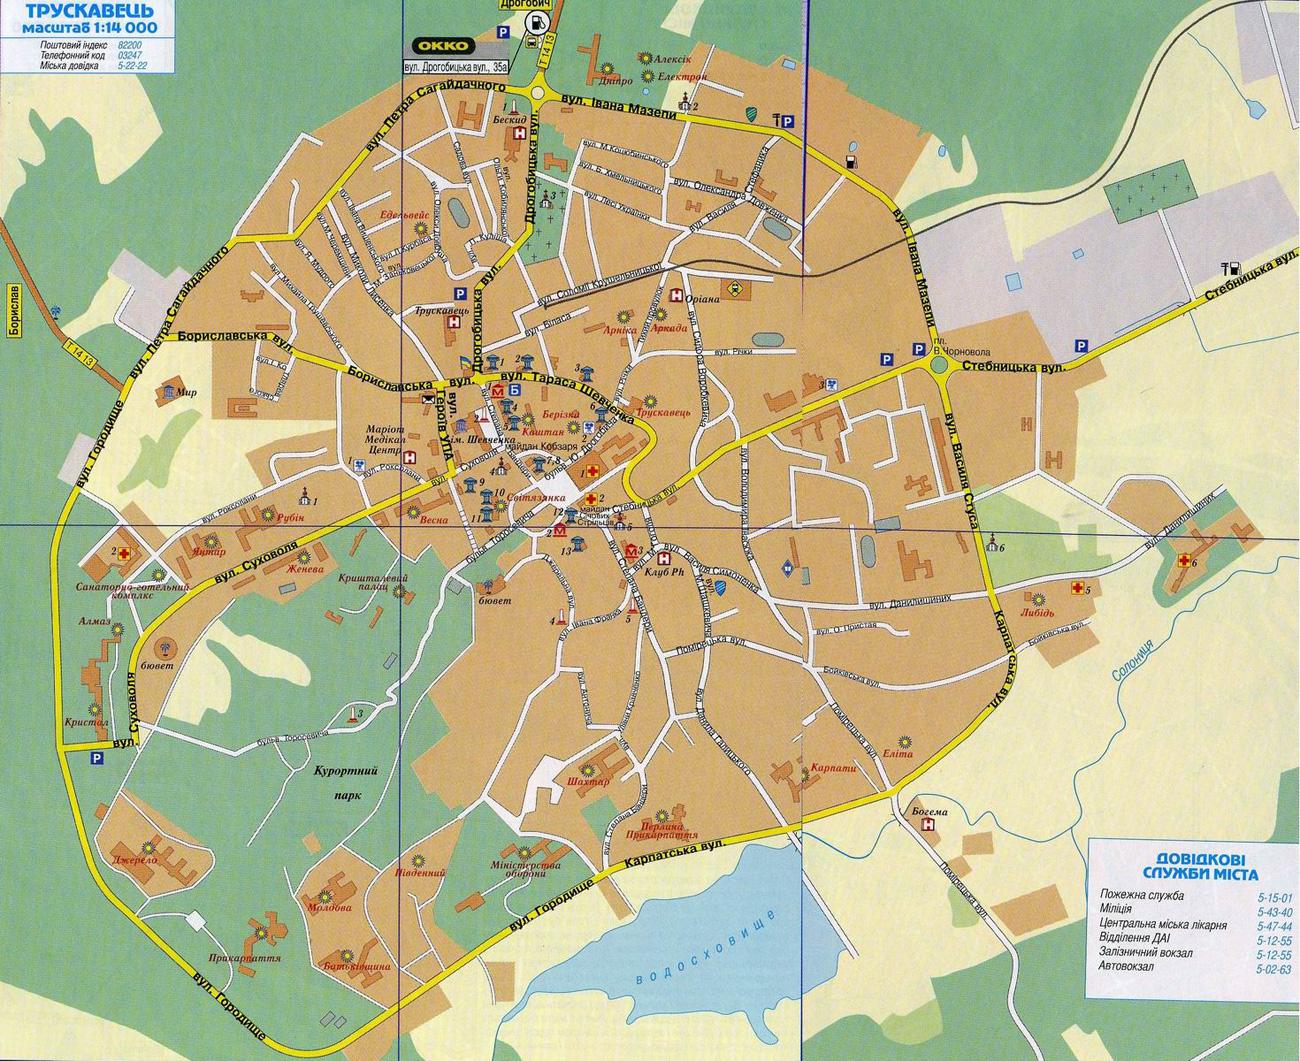 Карта города Трускавец